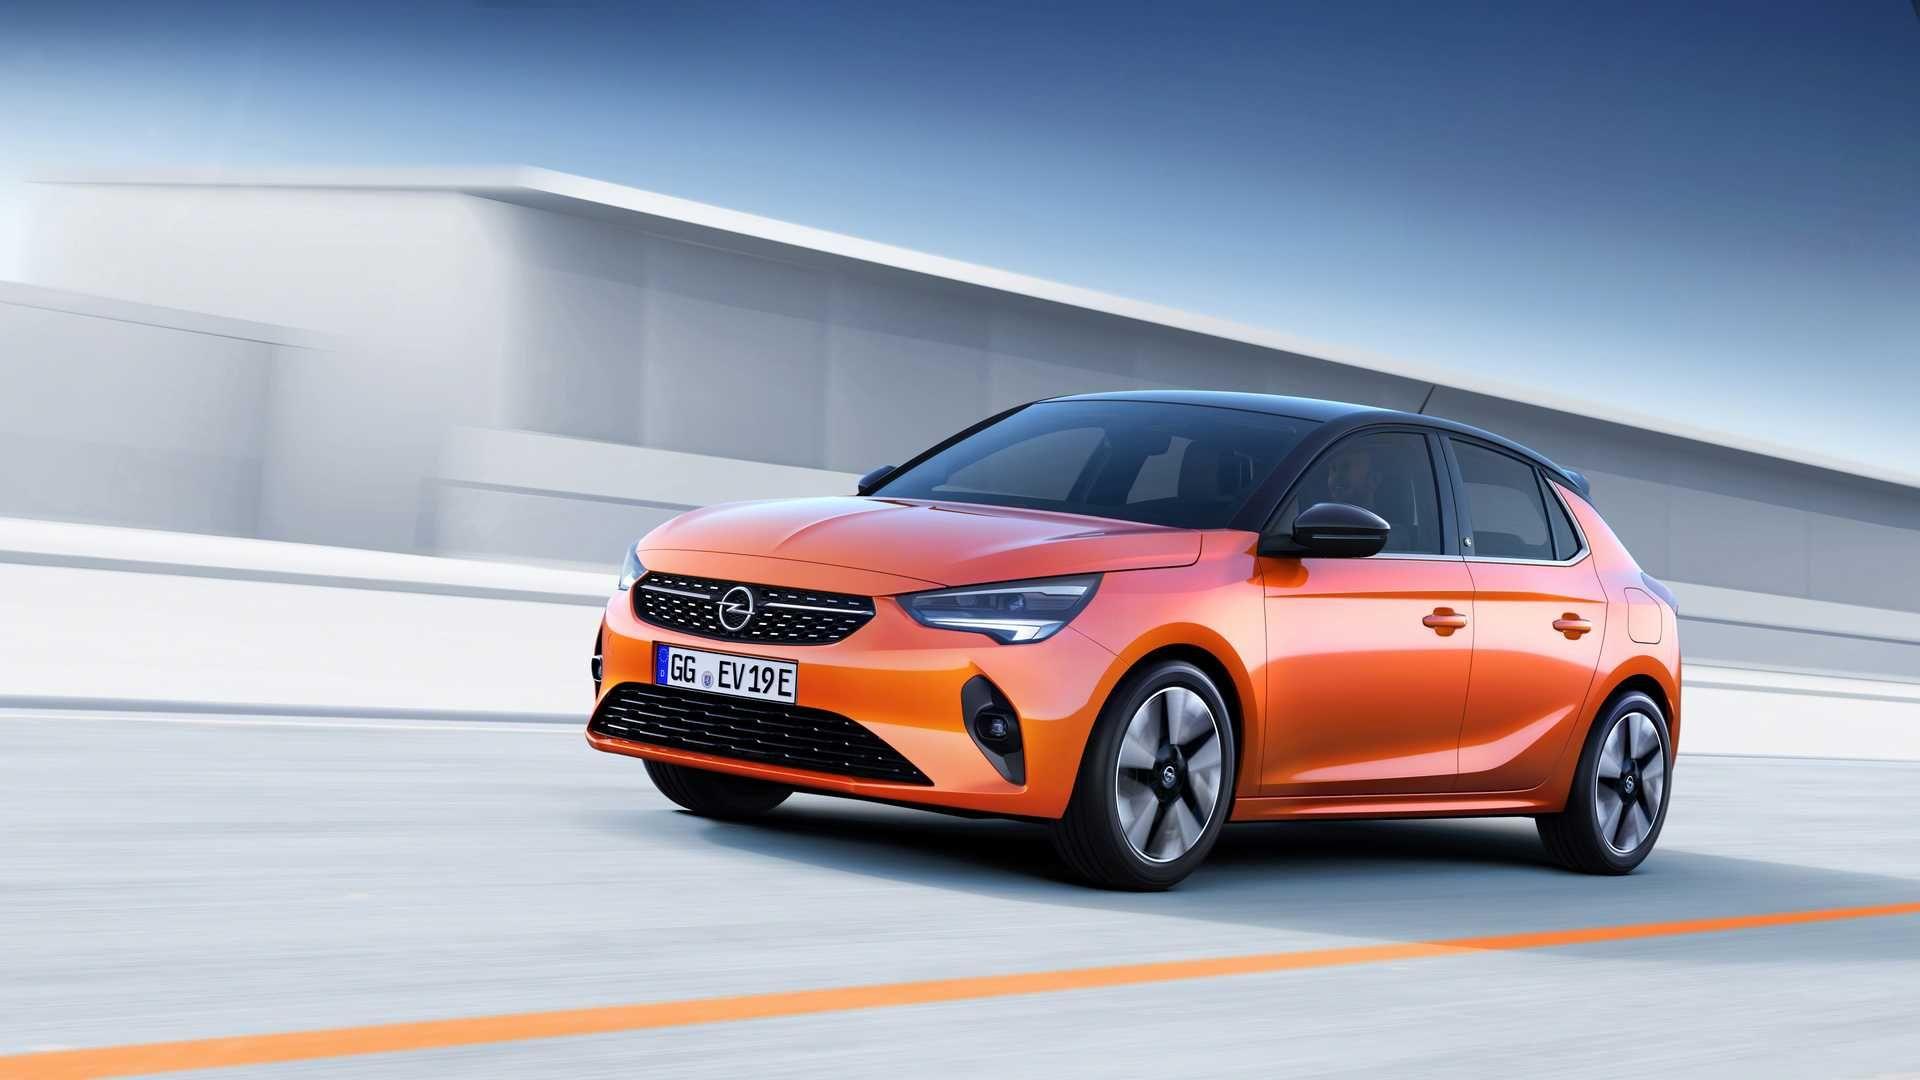 Opel CorsaE Revealed With Sharp Look, 205Mile Range